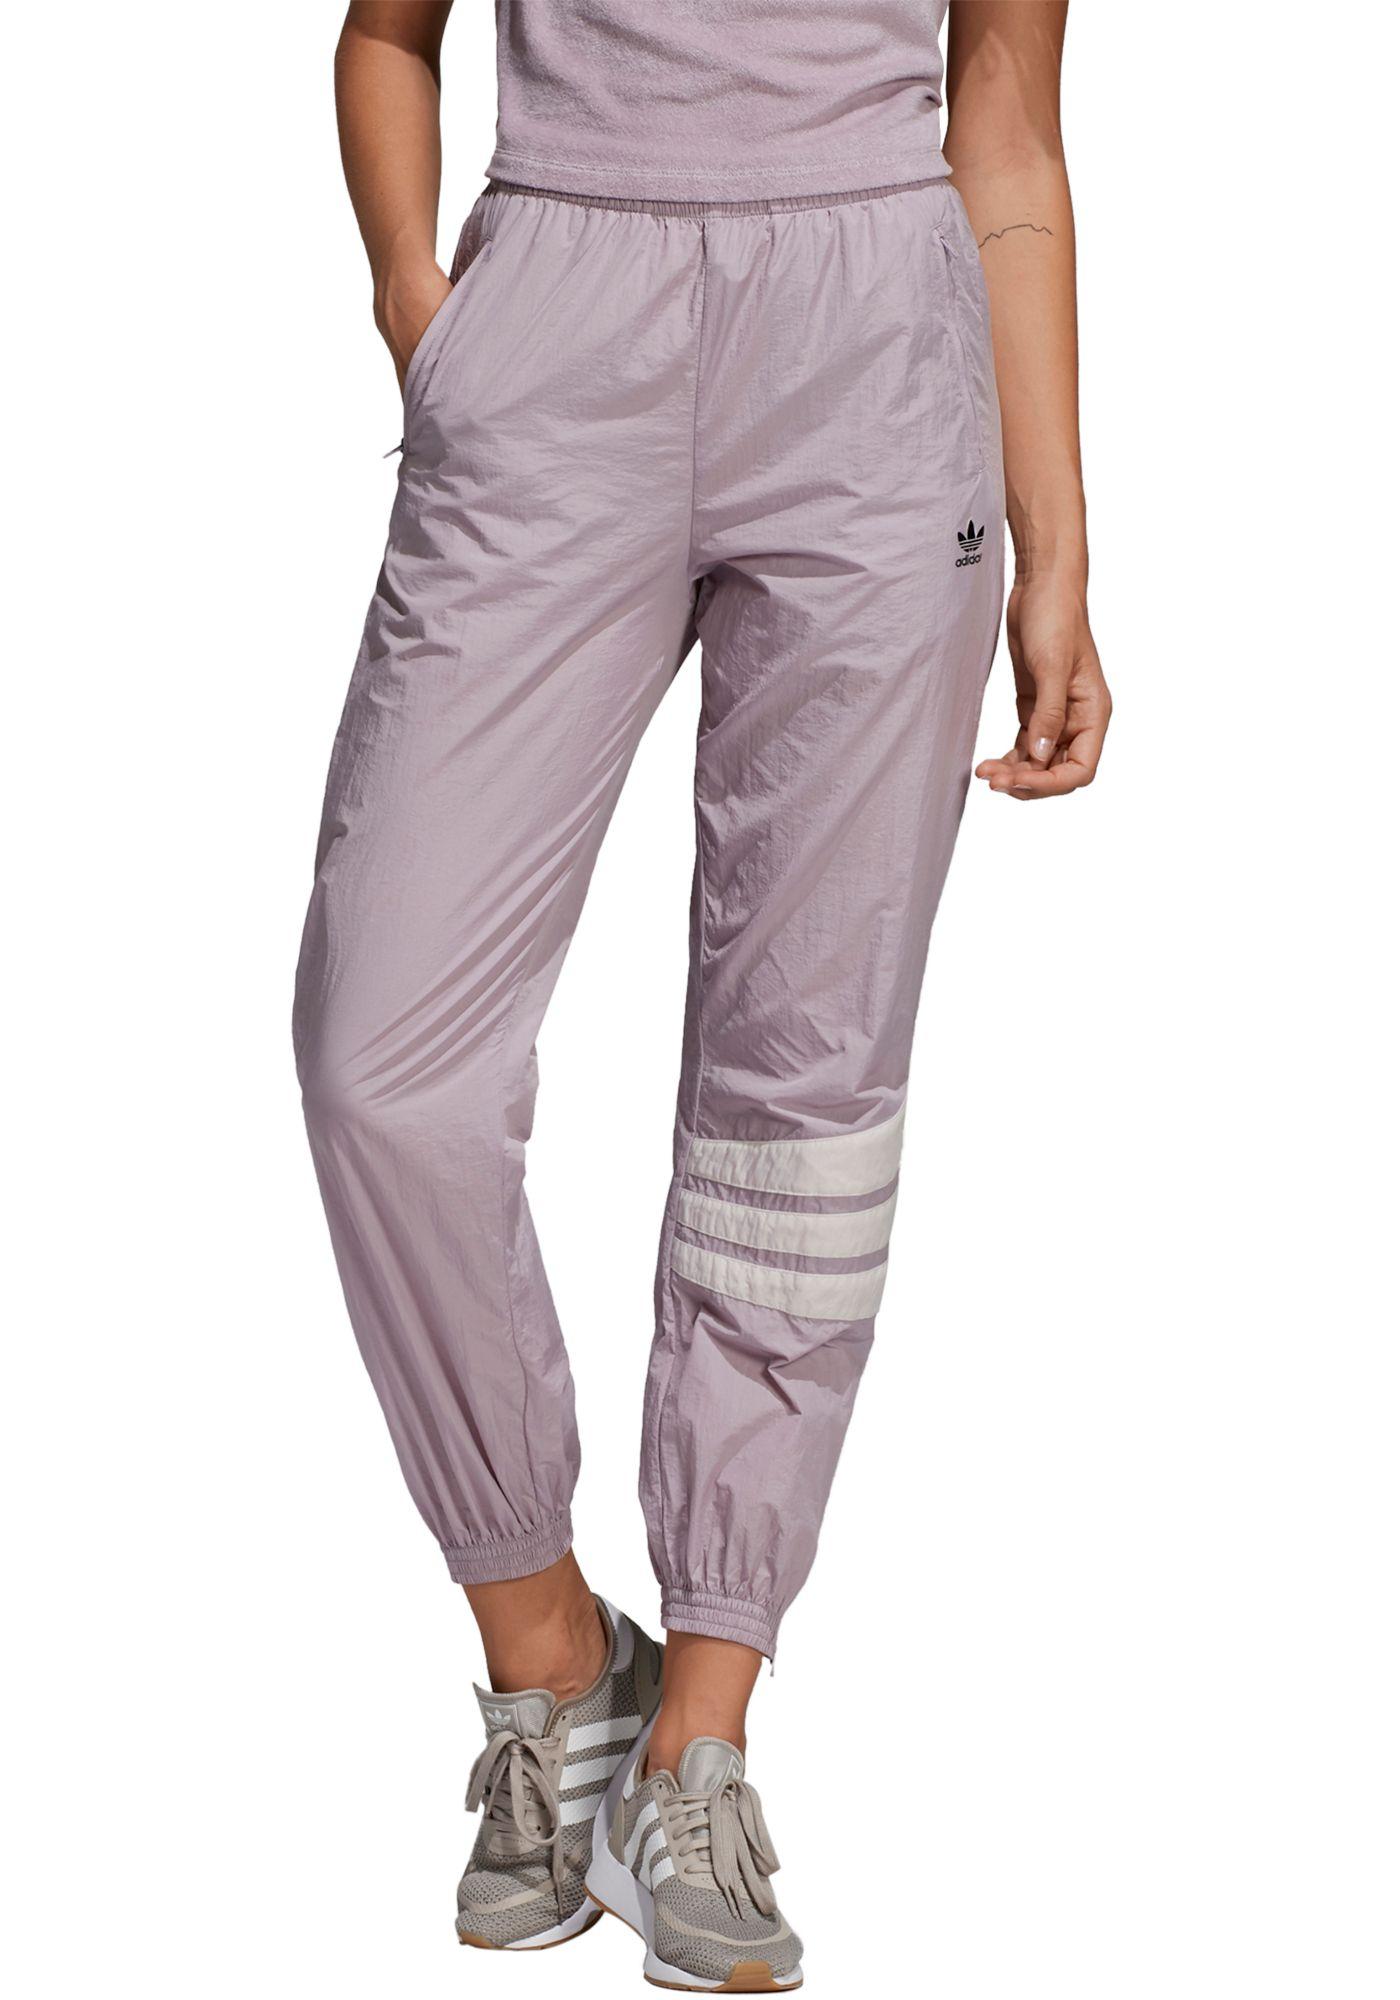 adidas Originals Women's Cuffed Pants